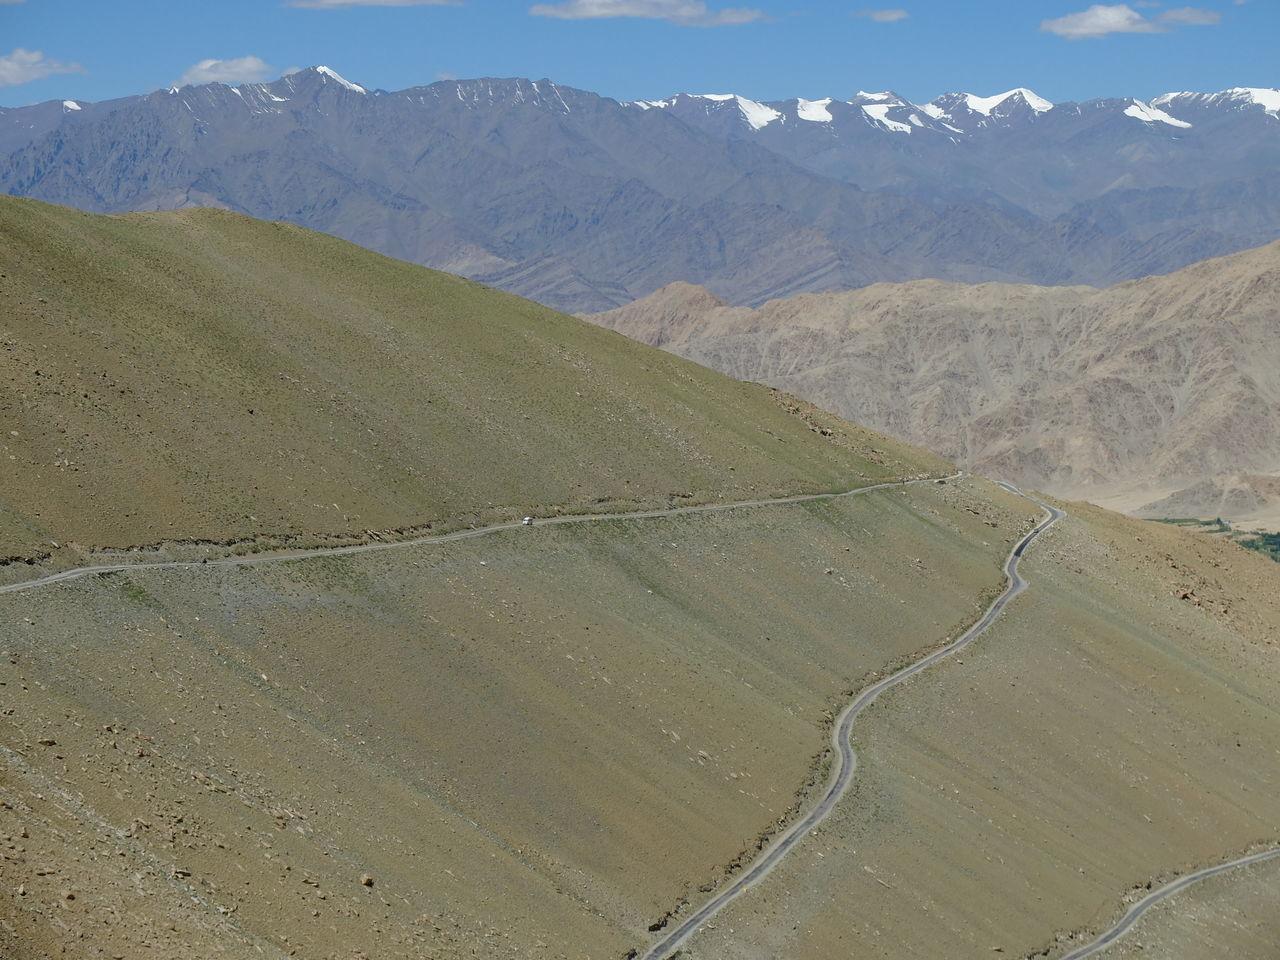 Dangerous Road Day Jammu And Kashmir Landscape Leh Ladakh Mountain Nature No People Outdoors Sand Sand Dune Scenics Sky